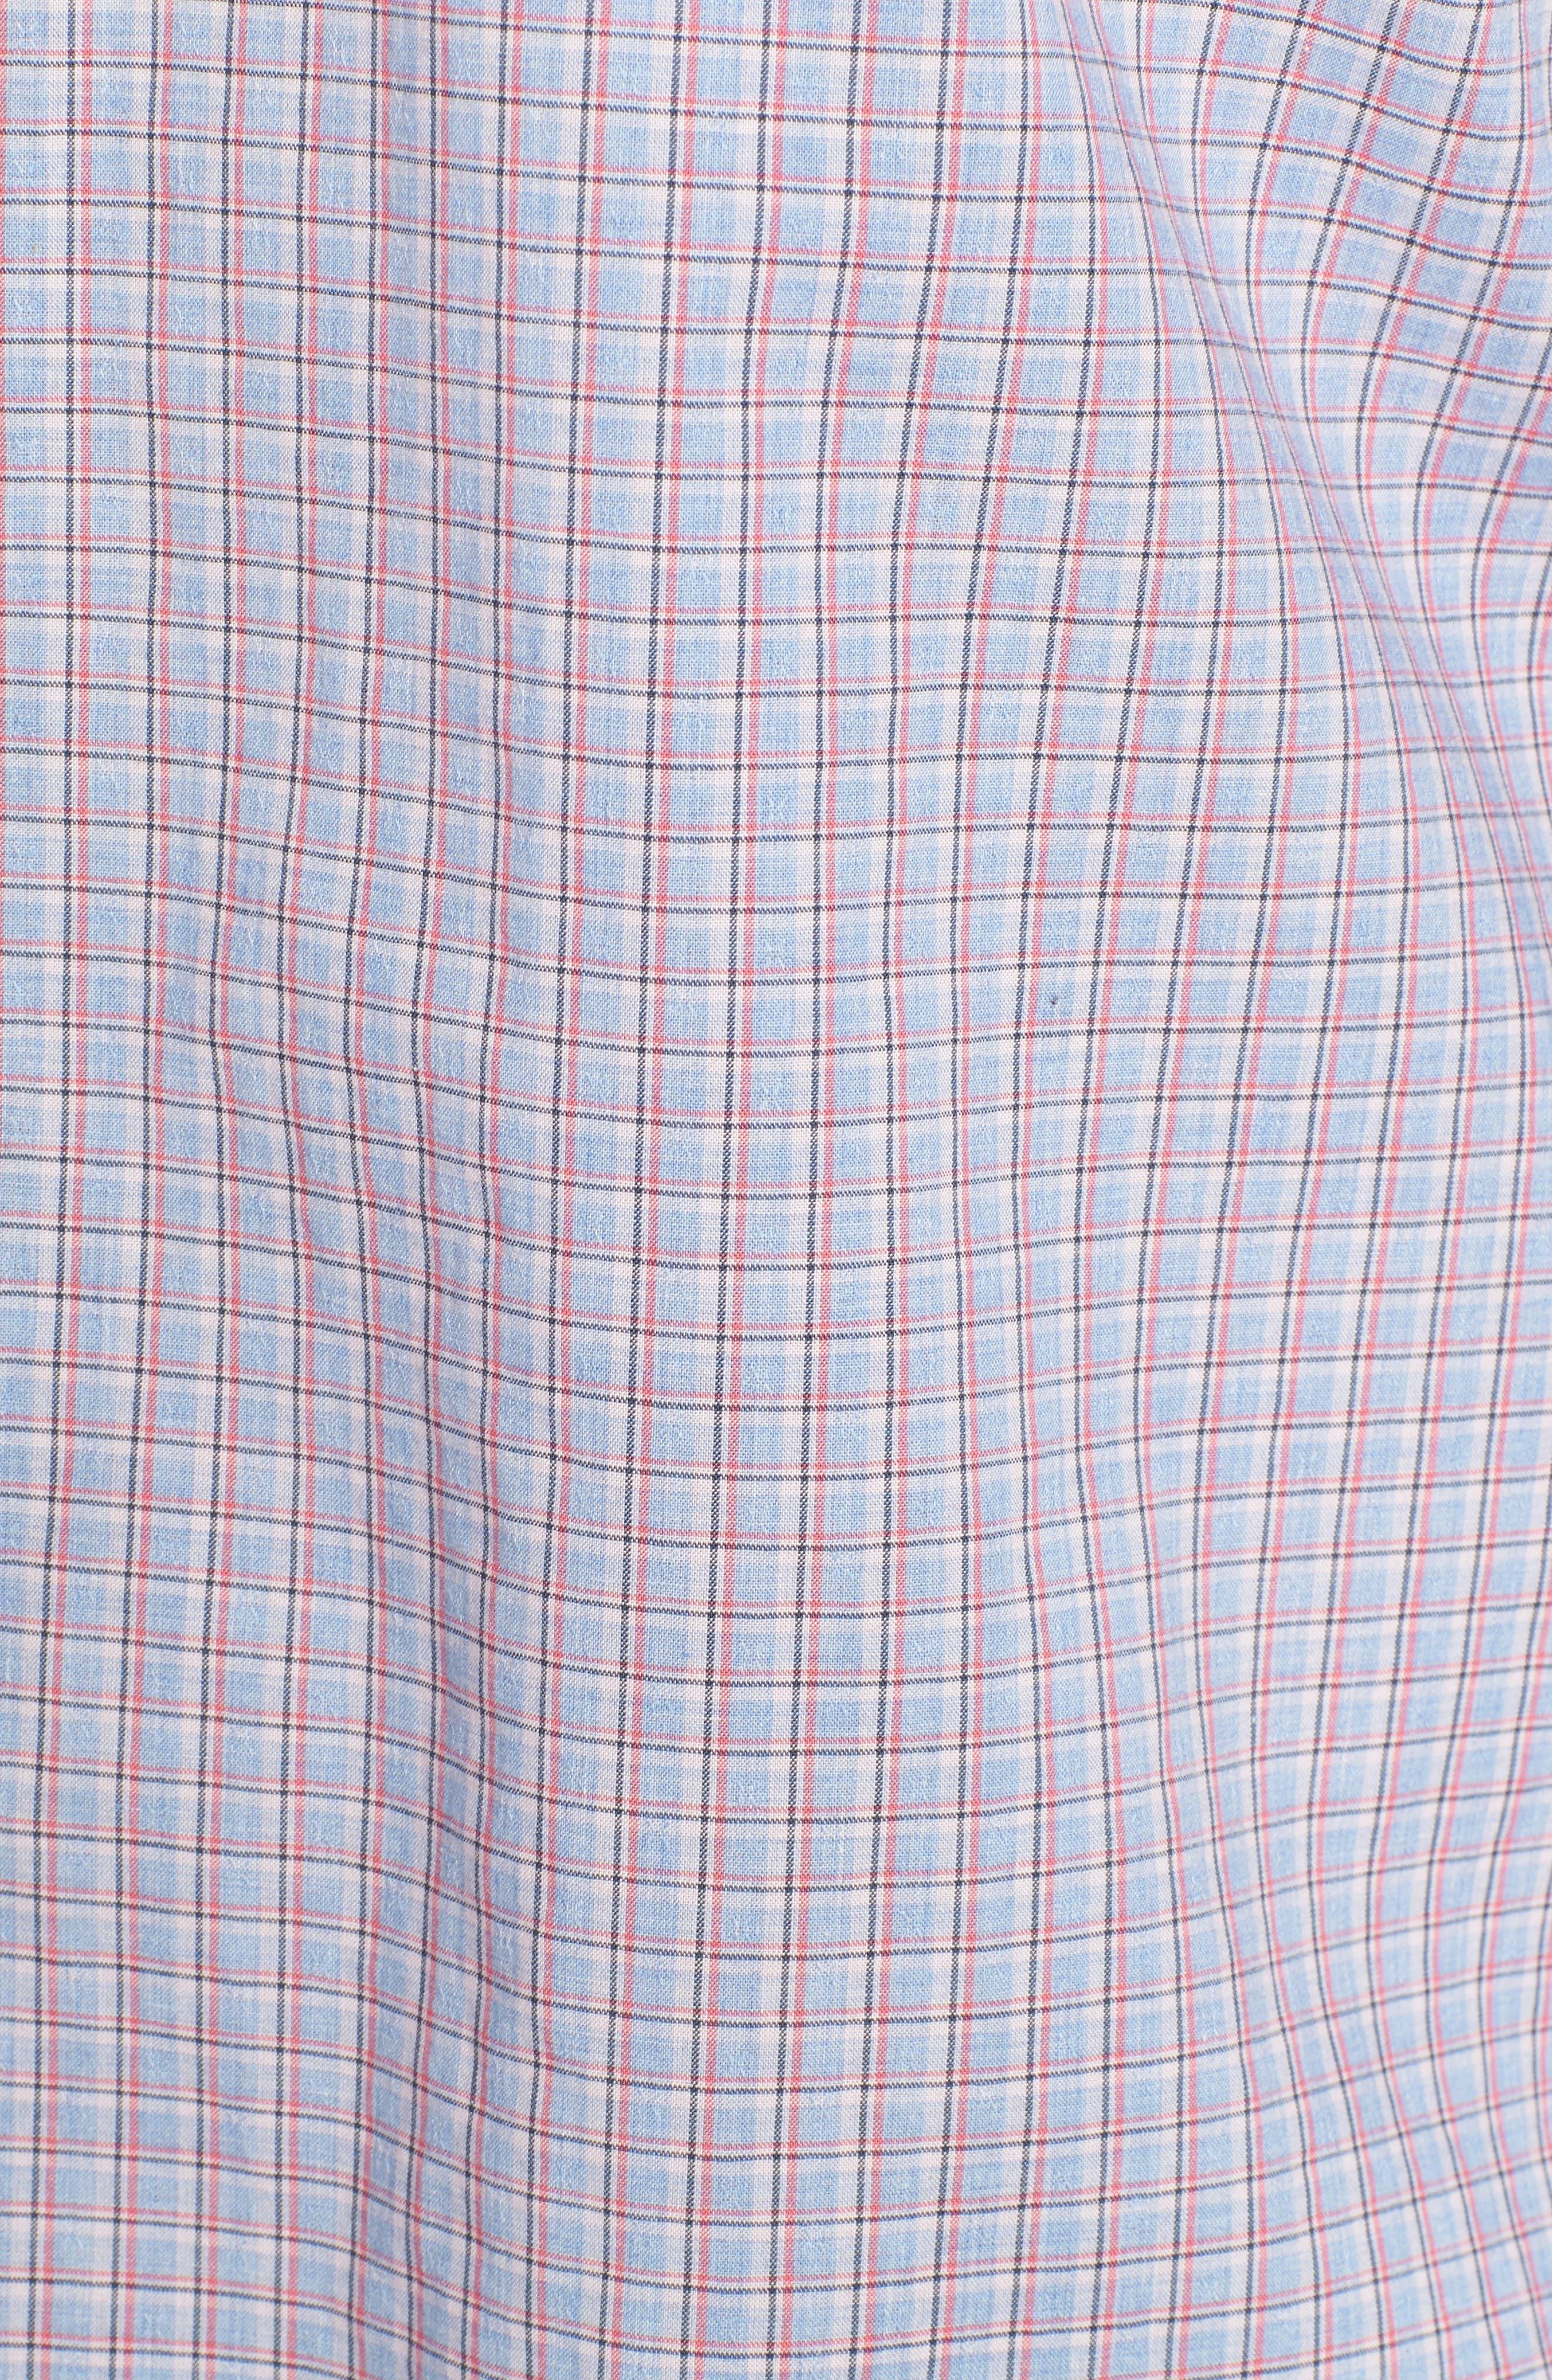 Drozdov Plaid Sport Shirt,                             Alternate thumbnail 5, color,                             Pink